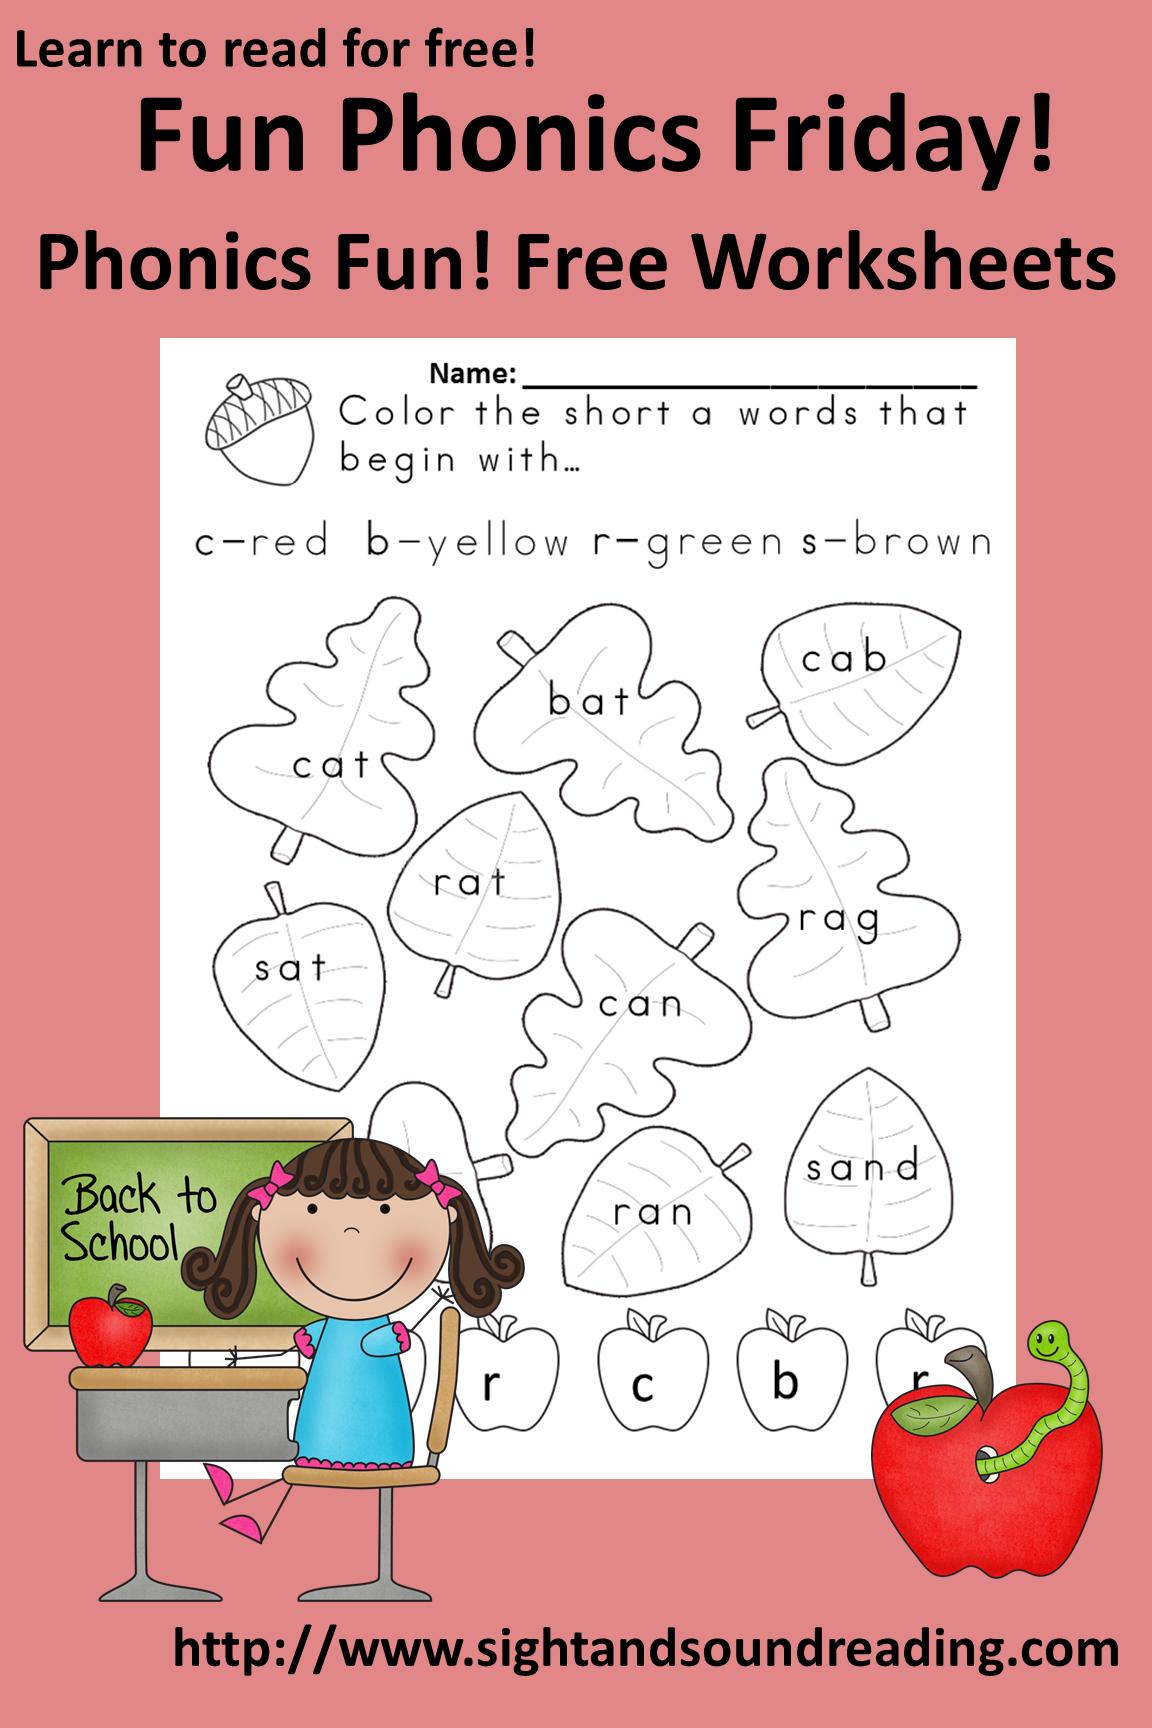 Free Printable Worksheet For Kindergarten Phonics Templates and – Phonics for Kindergarten Worksheets